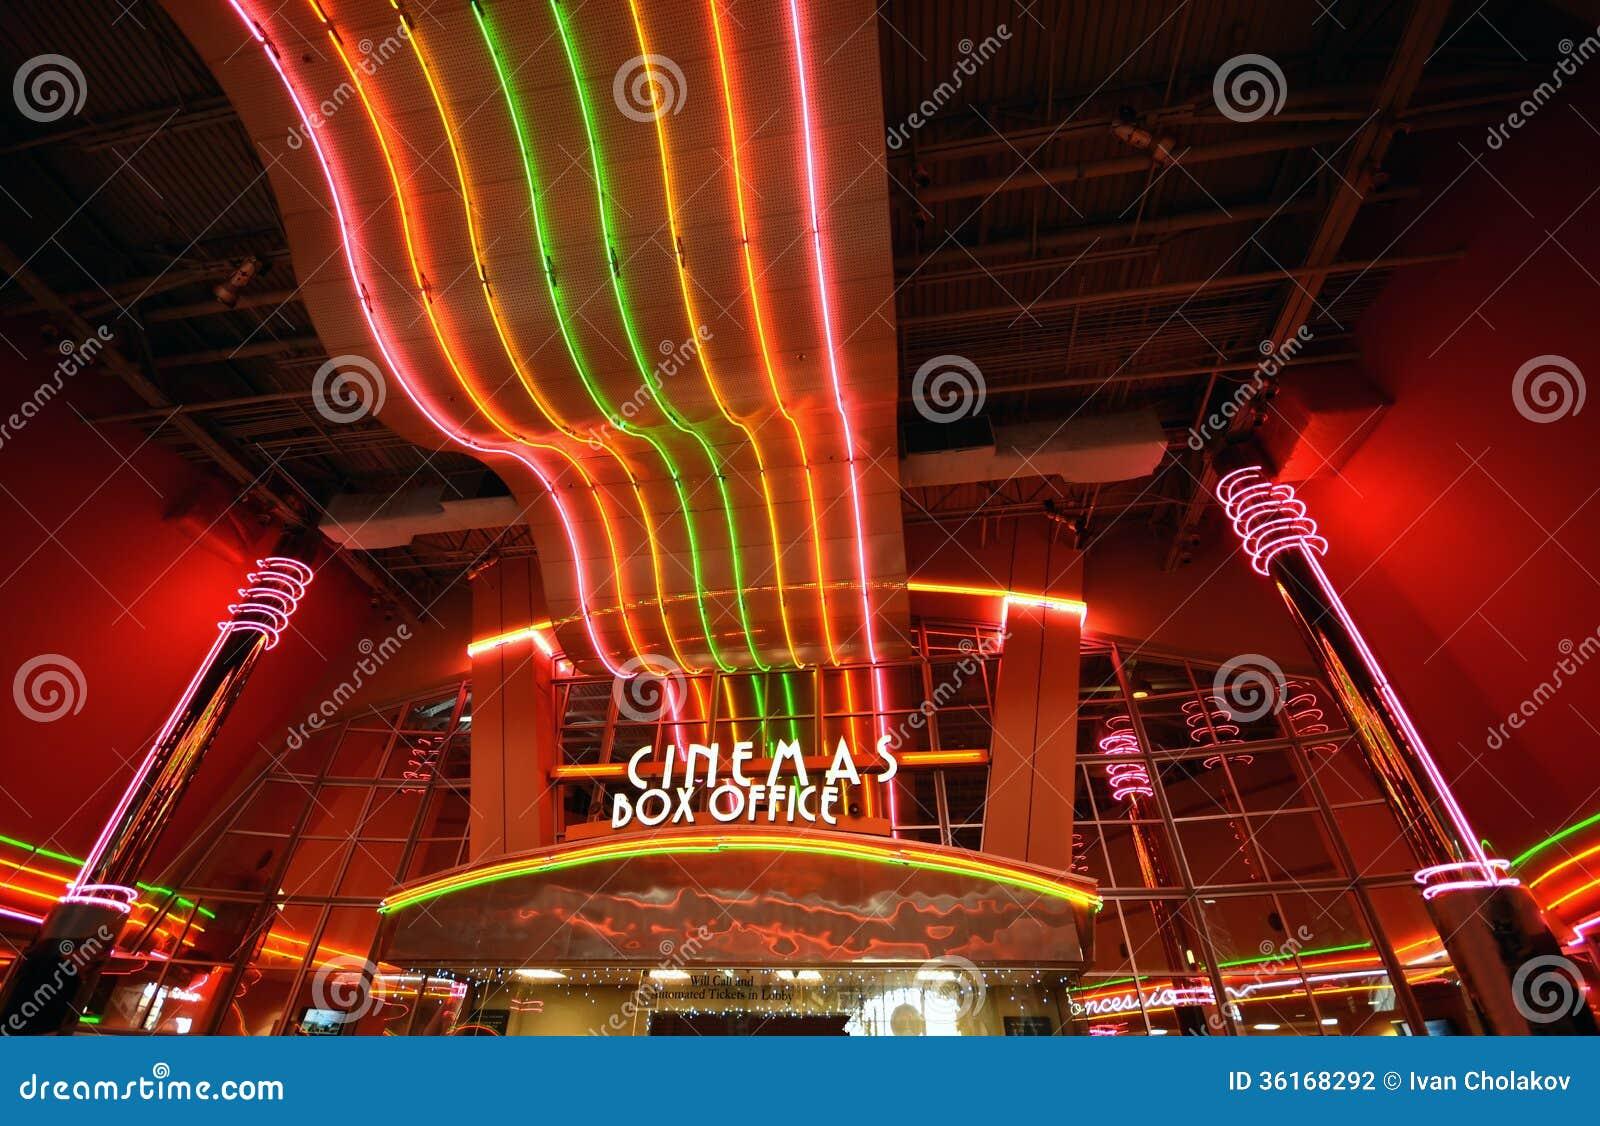 Cinema box effice stock photography image 36168292 - Box office cinema mondial ...